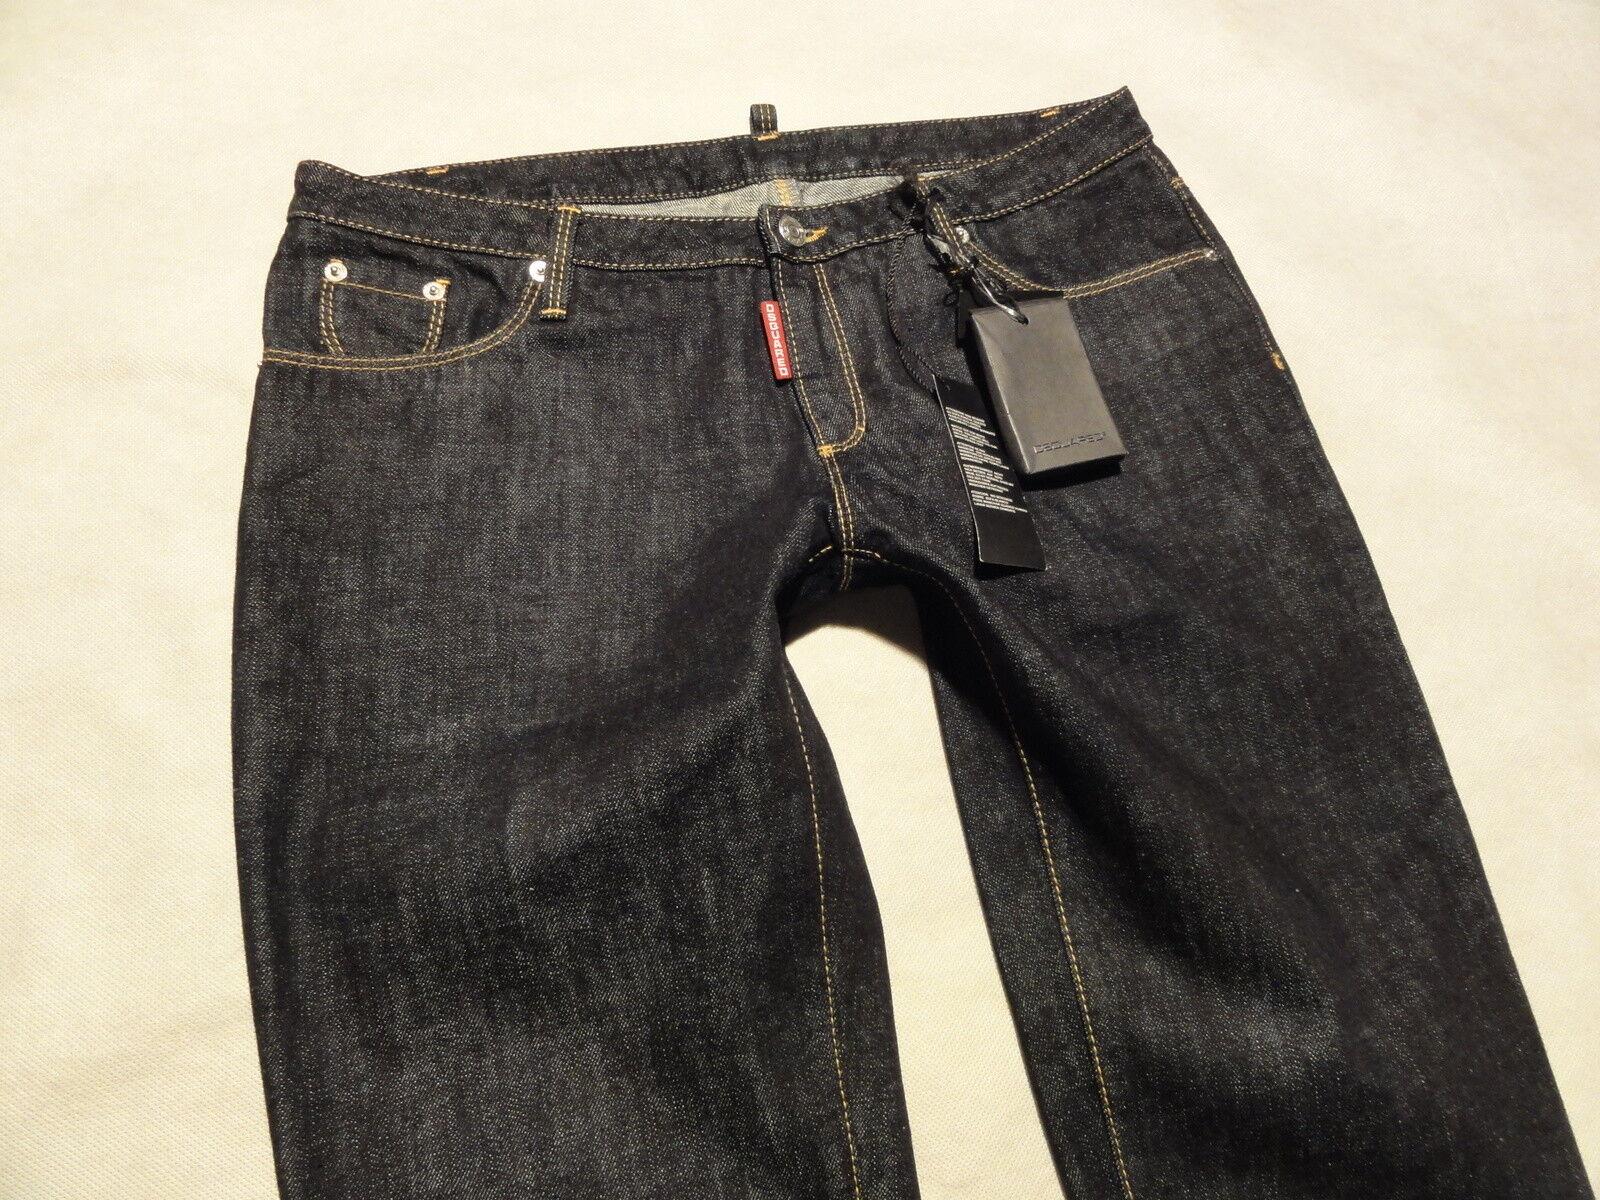 DSQUARED2 - MOD.72 size 46 (W35L36) - women's jeans